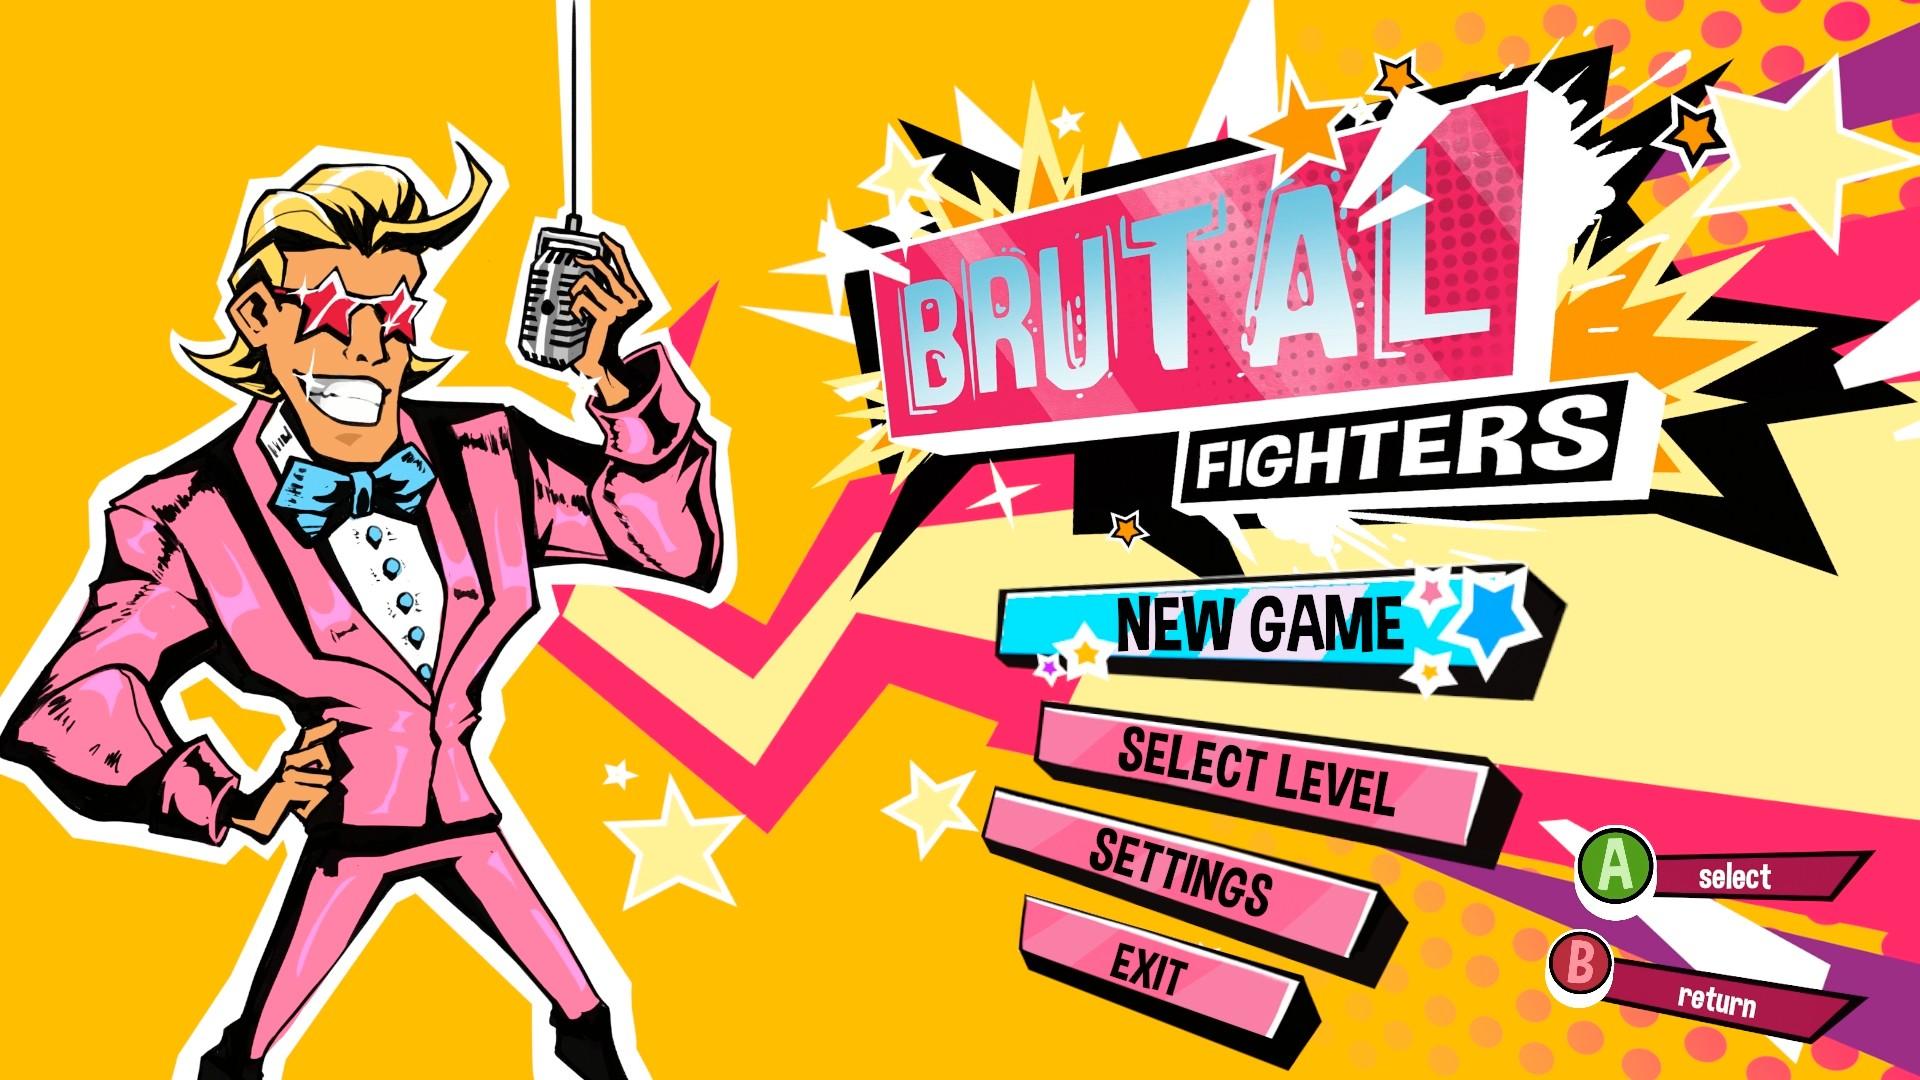 BrutalFighter_Screenshot (3).jpg